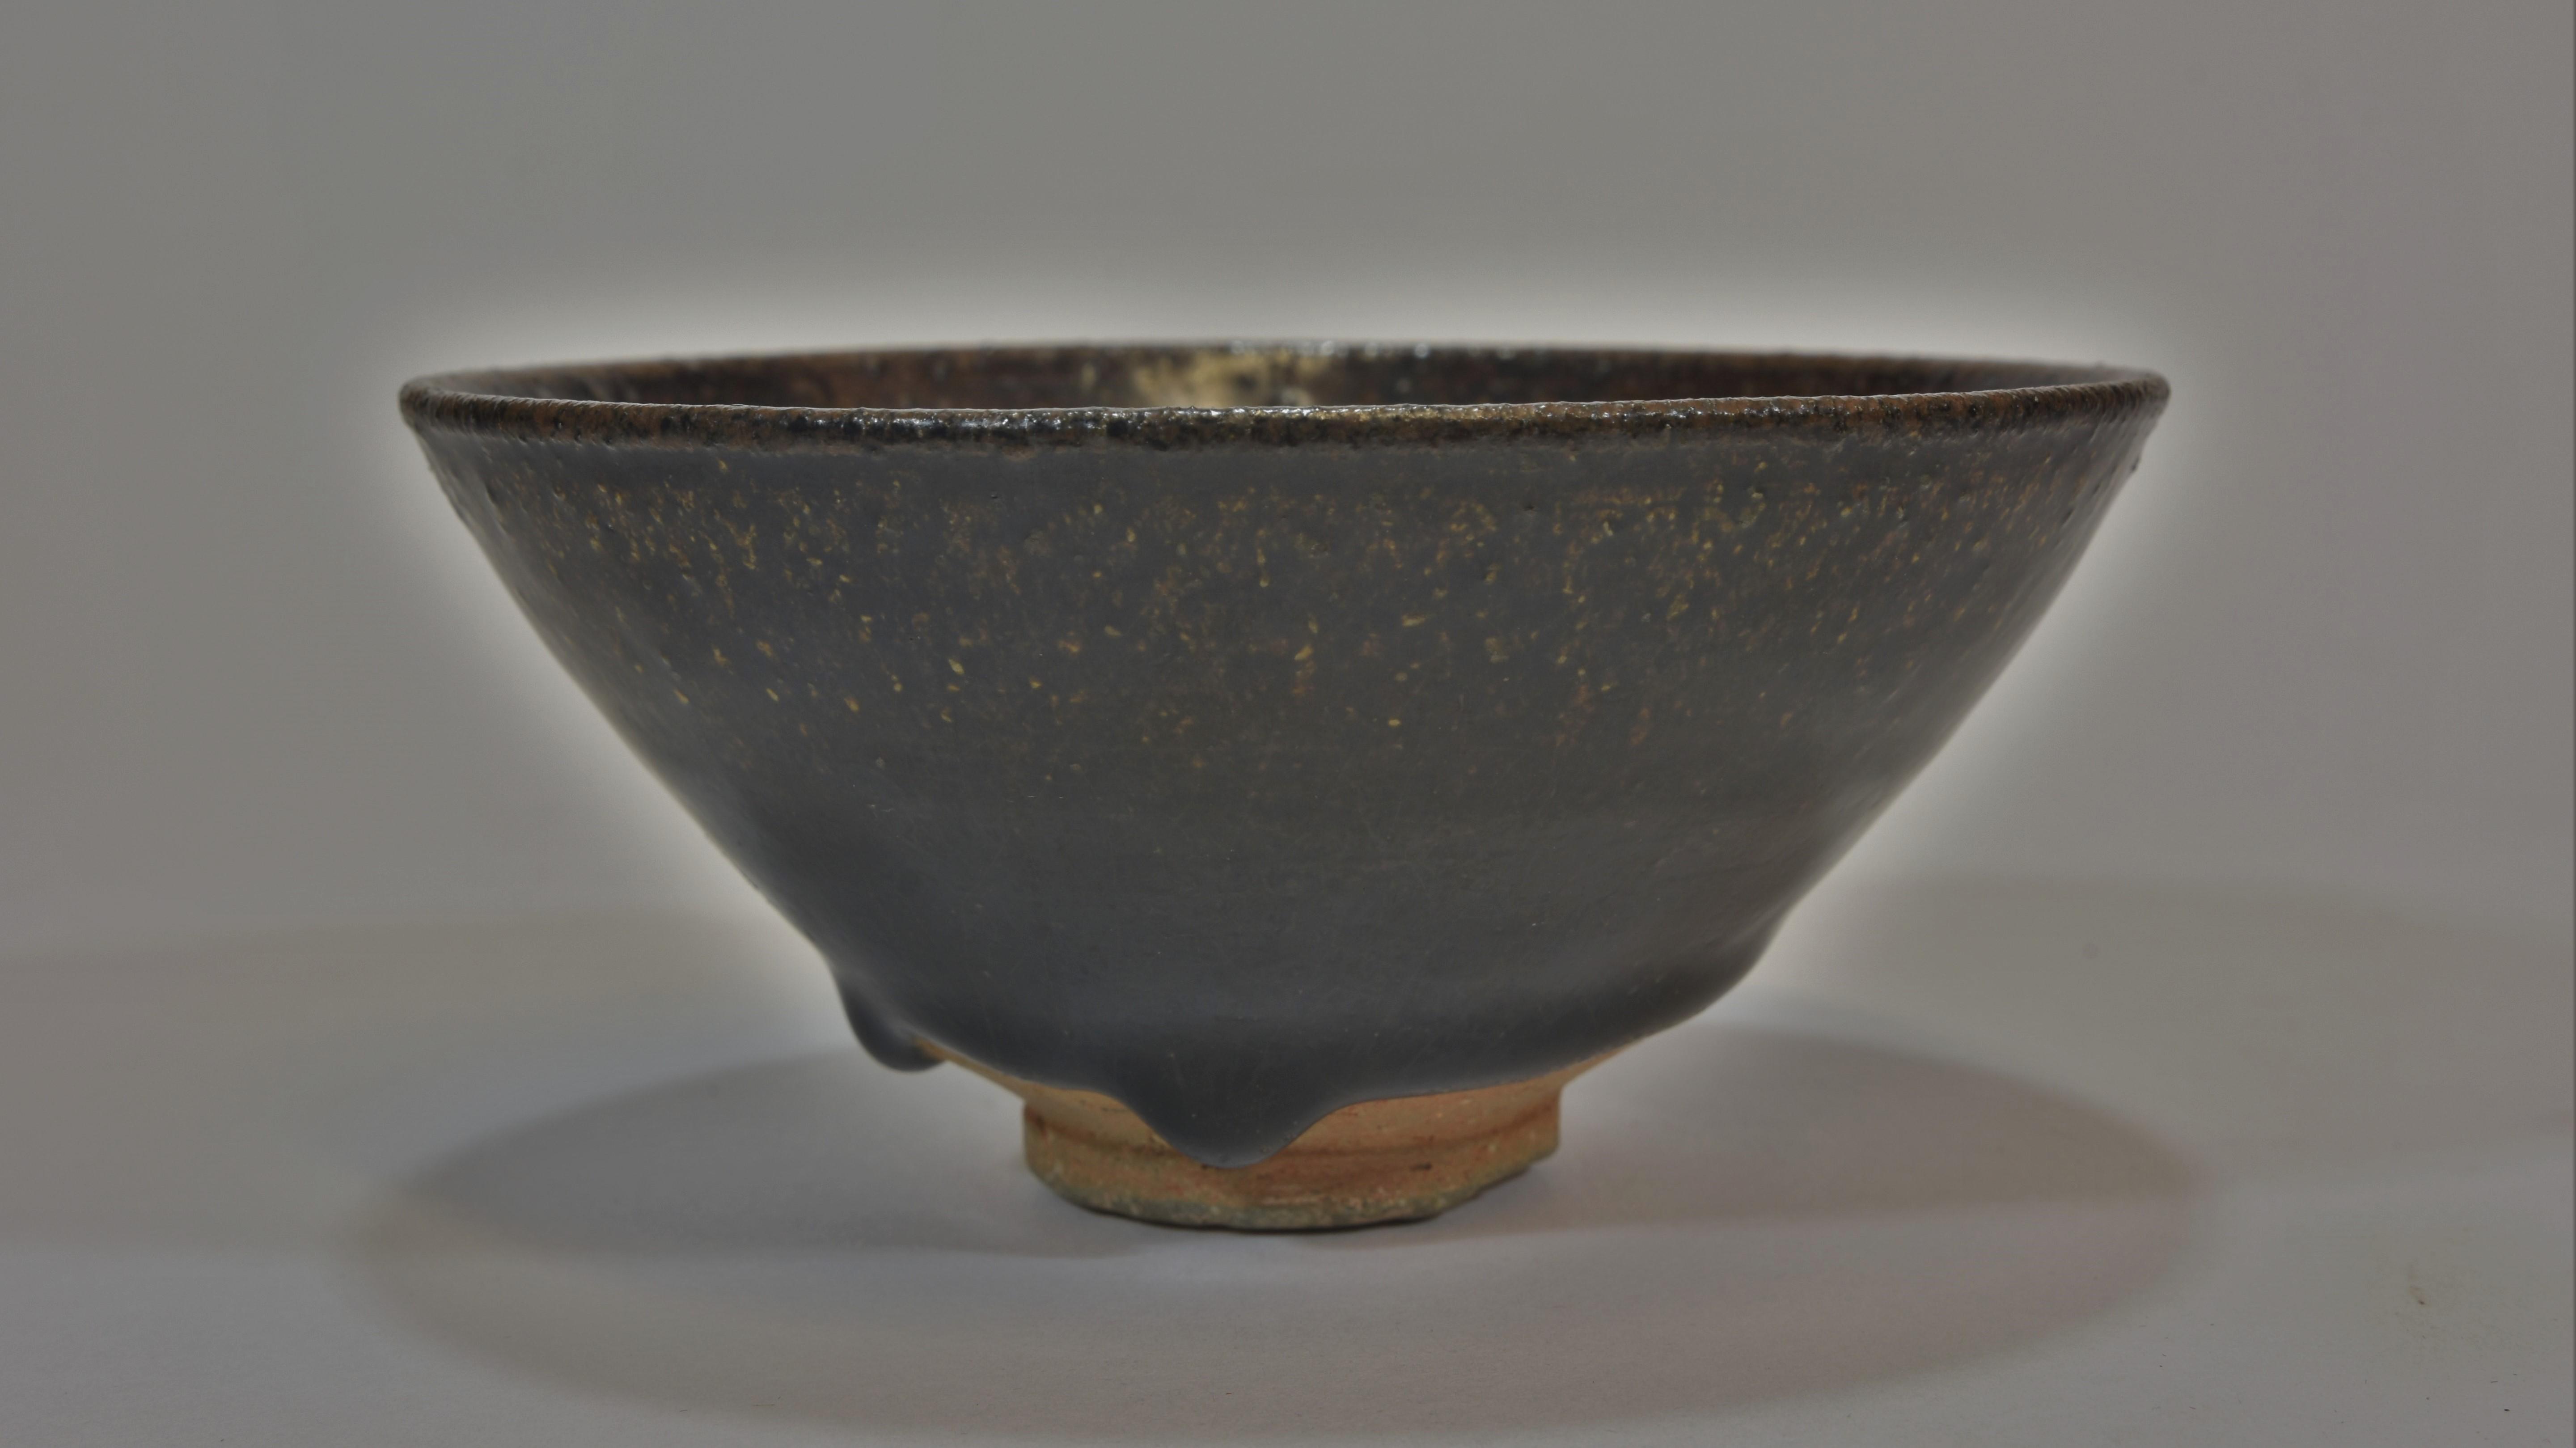 Lot 22 - A Song dynasty black glazed tea bowl 12cm diameter宋朝時期 黑釉茶碗